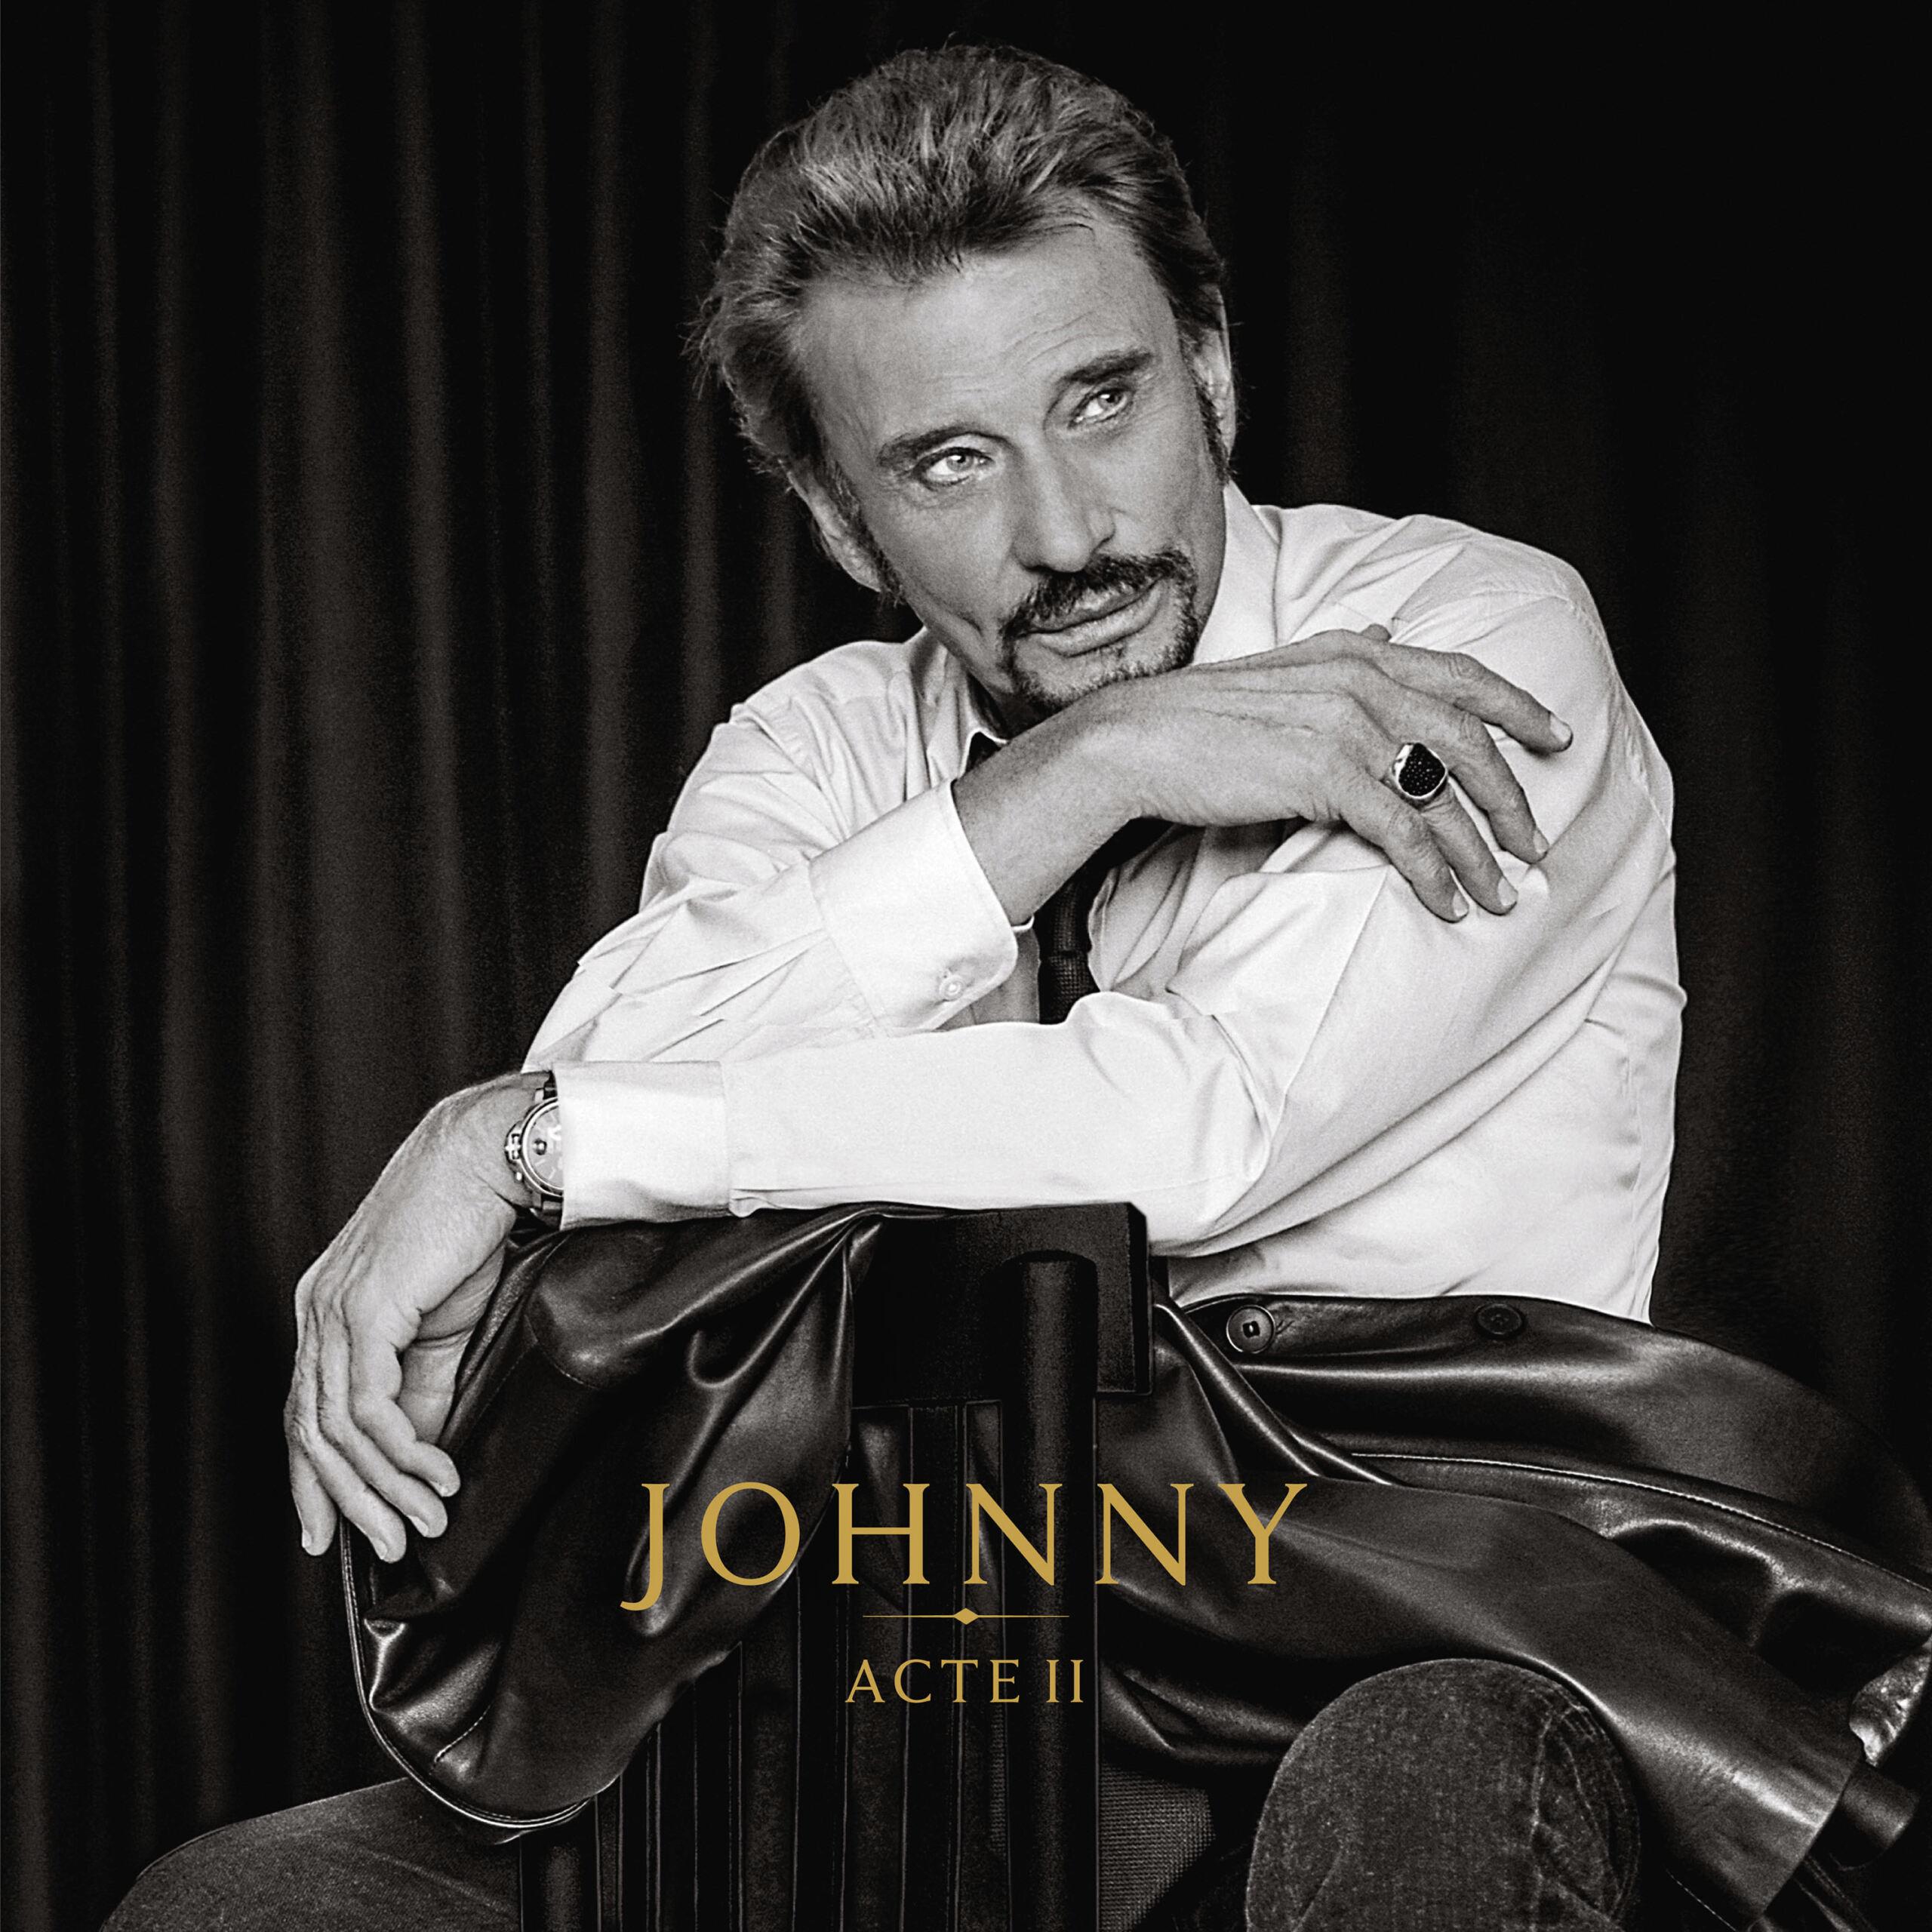 Visuel de l'Acte II Johnny39